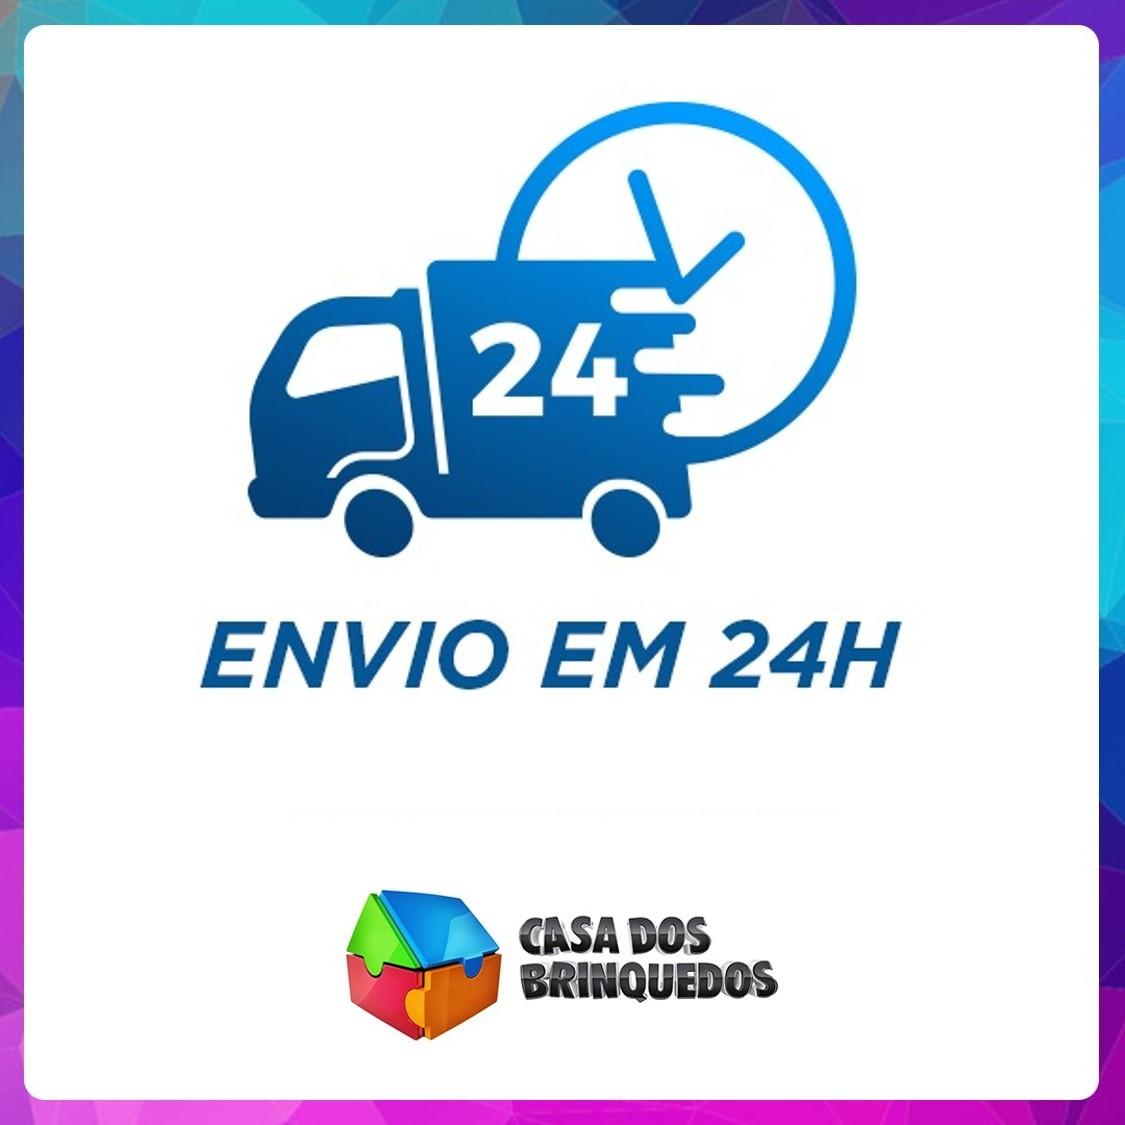 OVELHA DE VINIL 20CM X 14CM VB162 DB PLAY